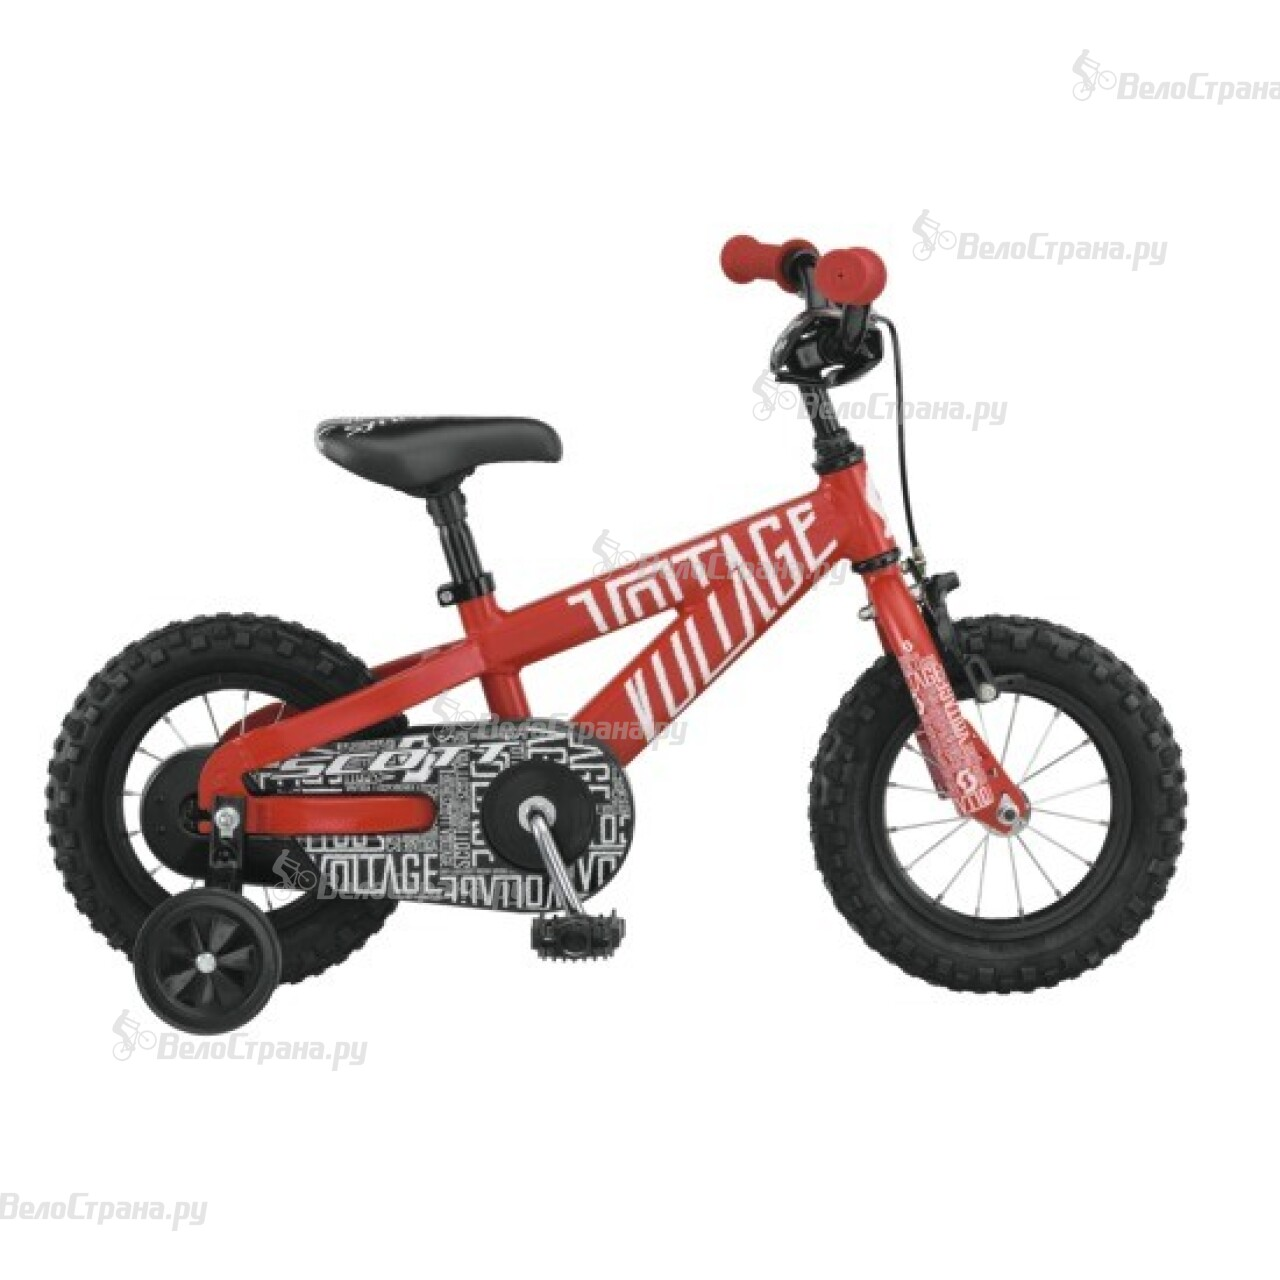 Велосипед Scott Voltage JR 12 (2014)